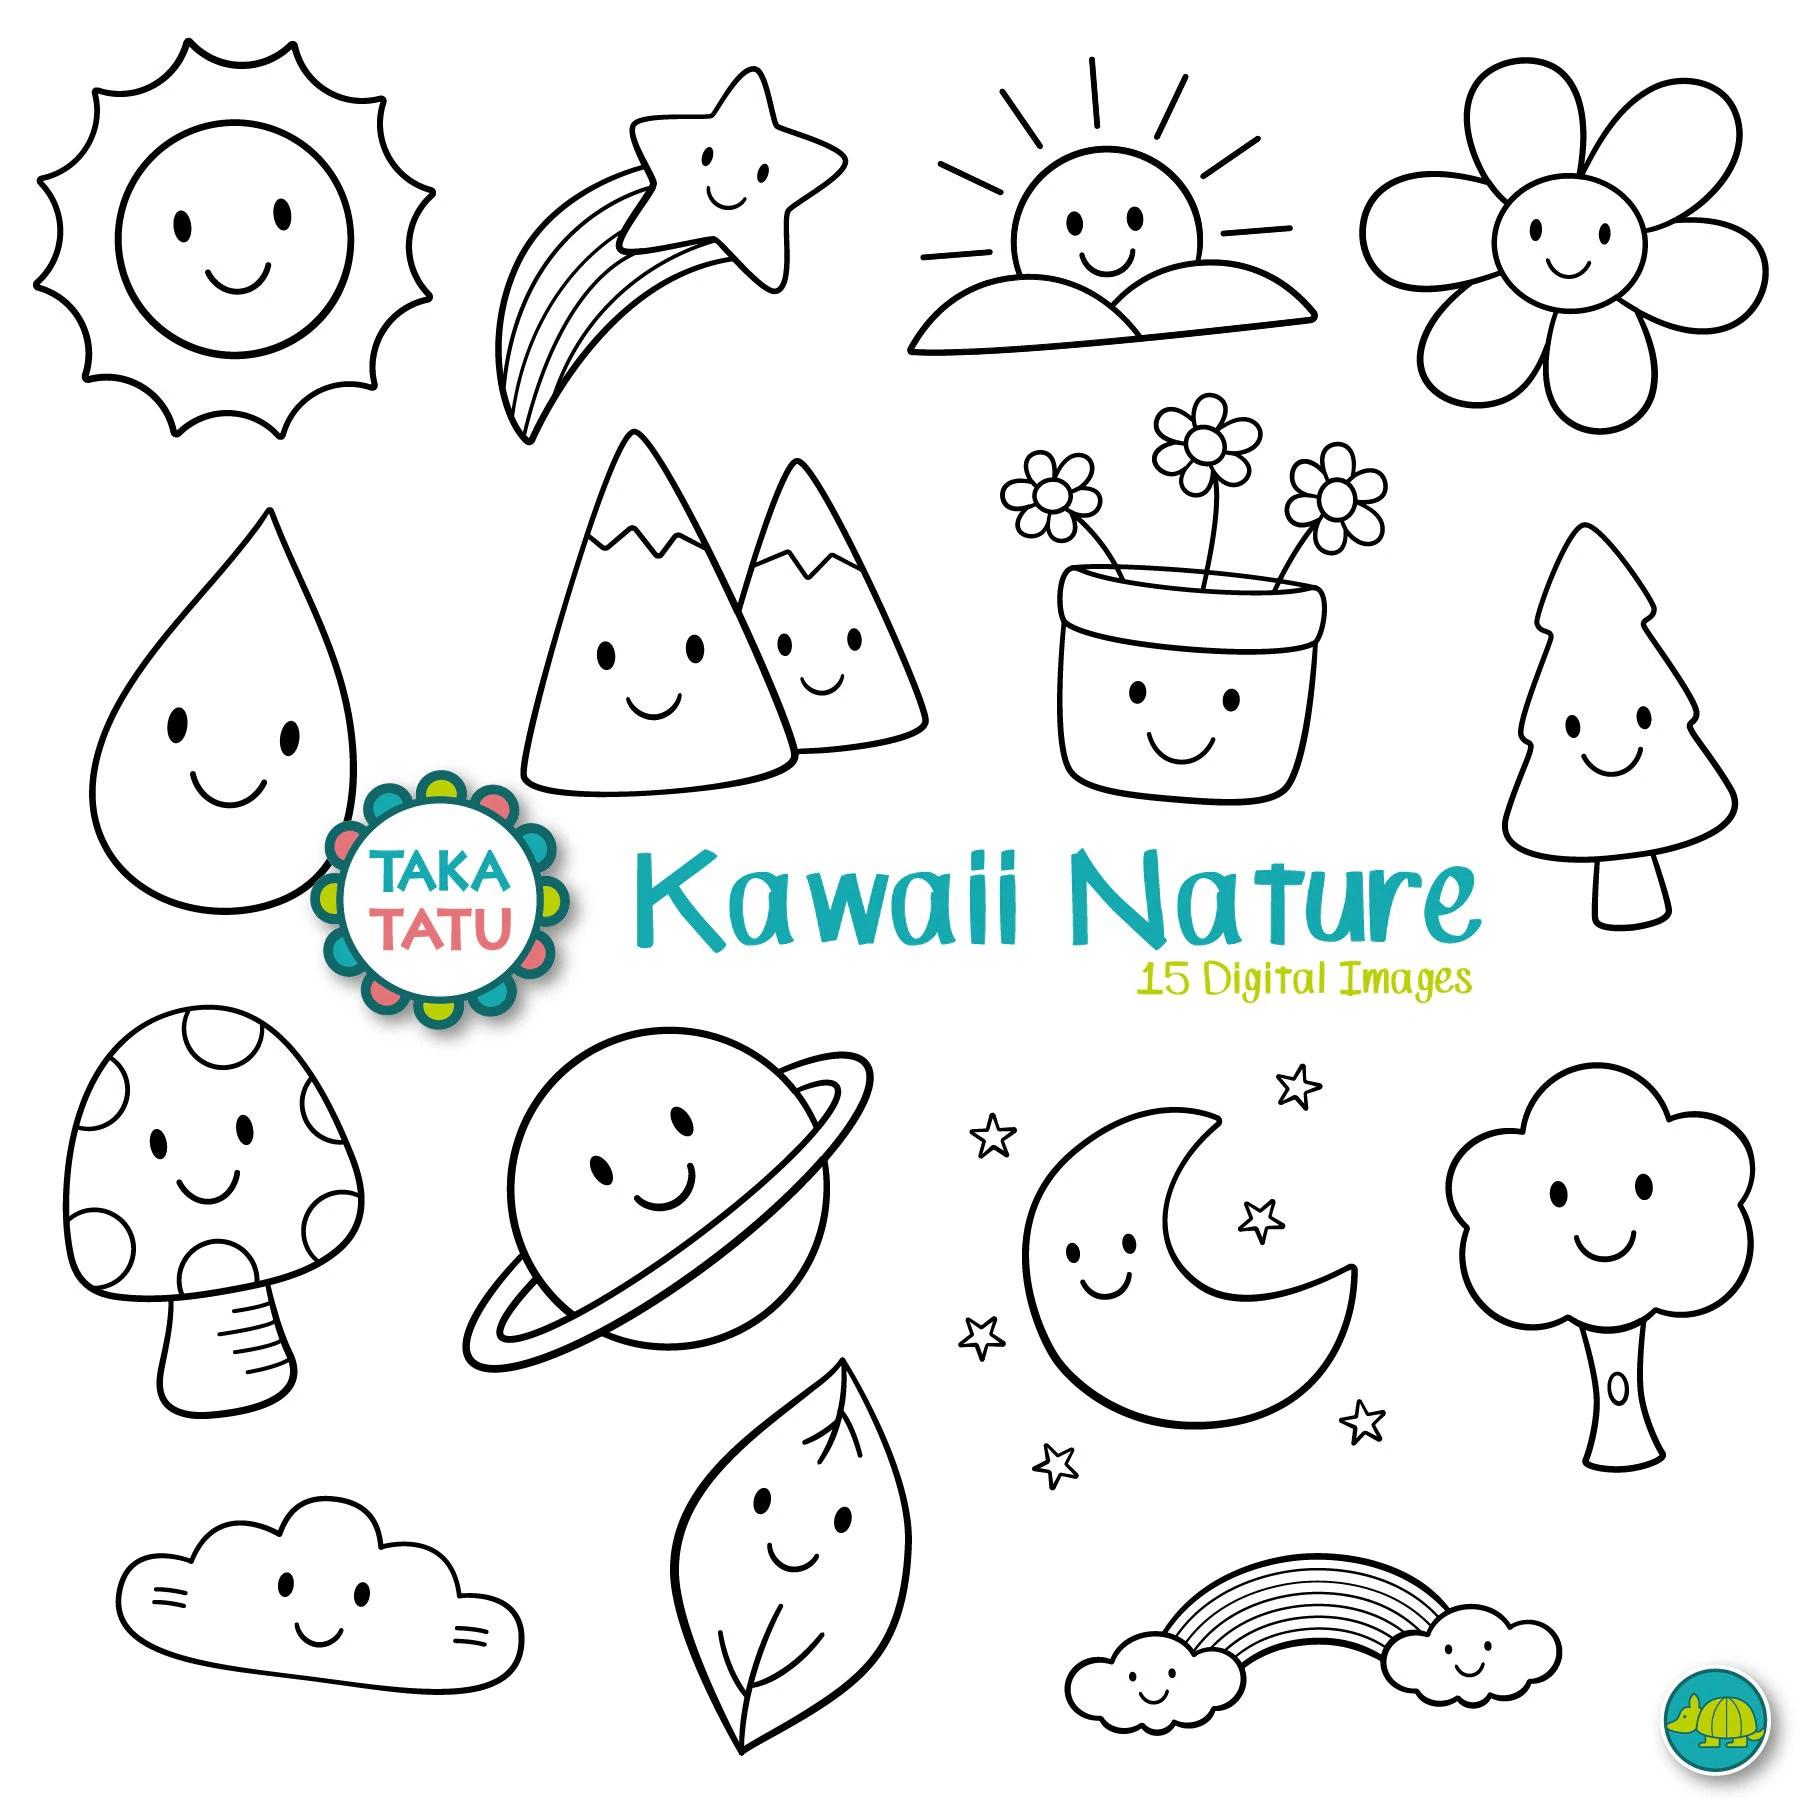 Kawaii Nature Digital Stamp Pack Kawaii Nature Clipart